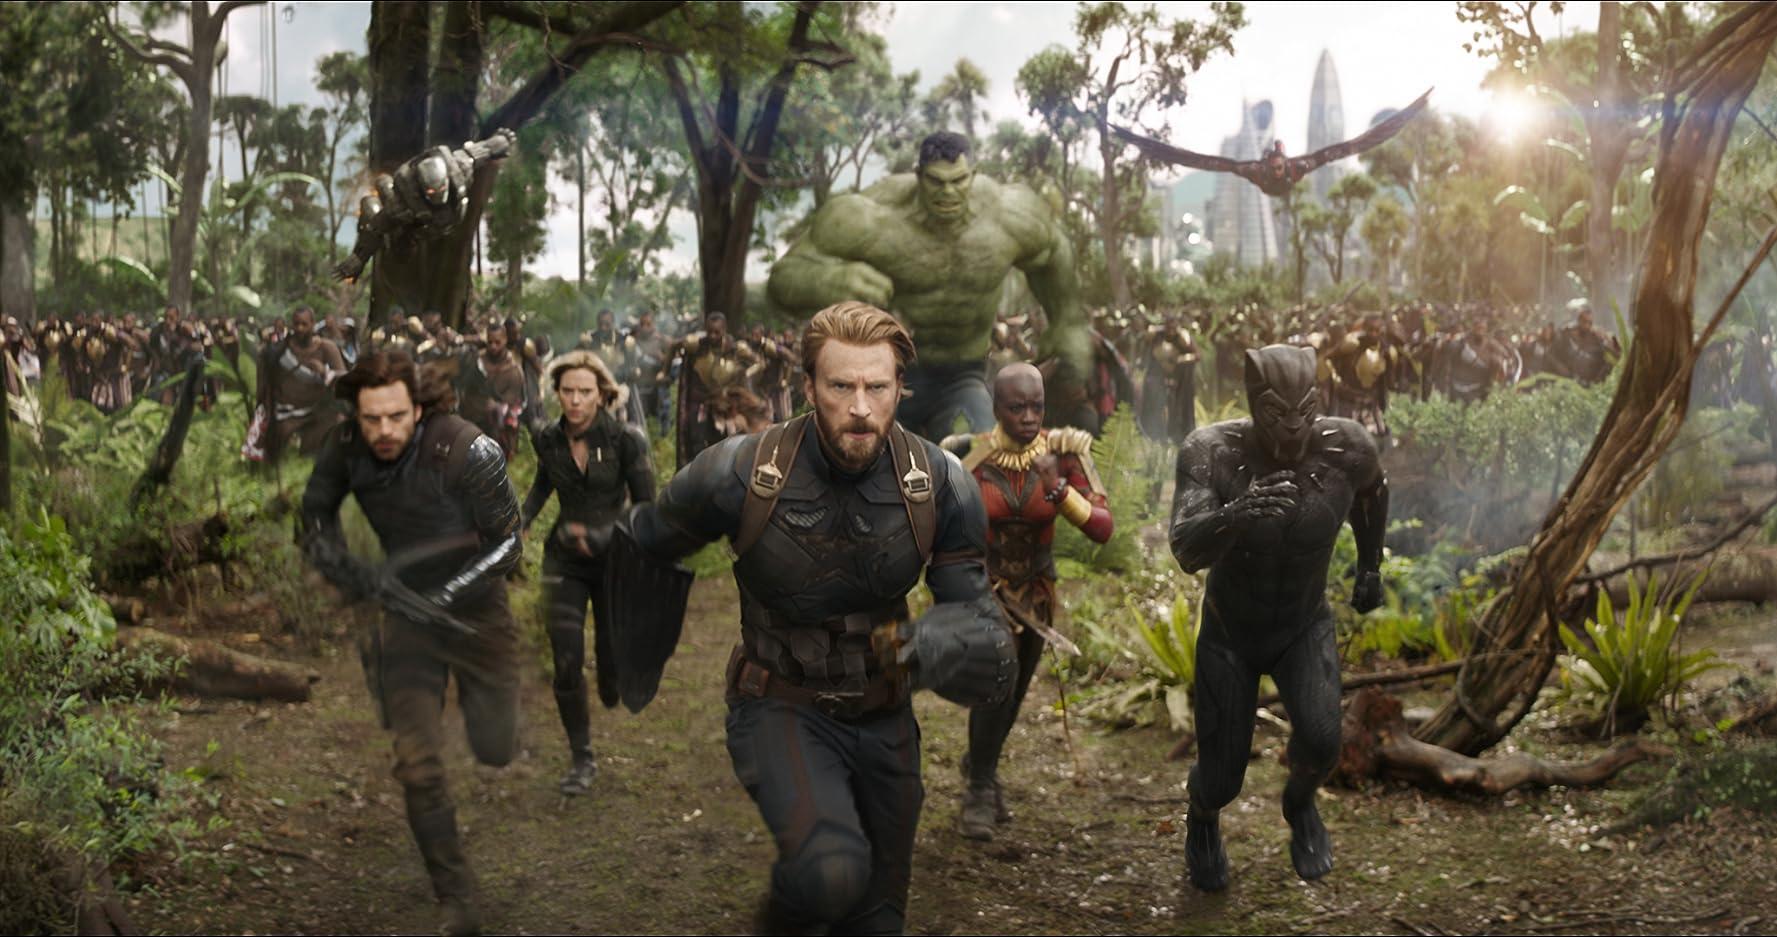 Don Cheadle, Chris Evans, Scarlett Johansson, Mark Ruffalo, Anthony Mackie, Chadwick Boseman, Sebastian Stan, and Danai Gurira in Avengers: Infinity War (2018)